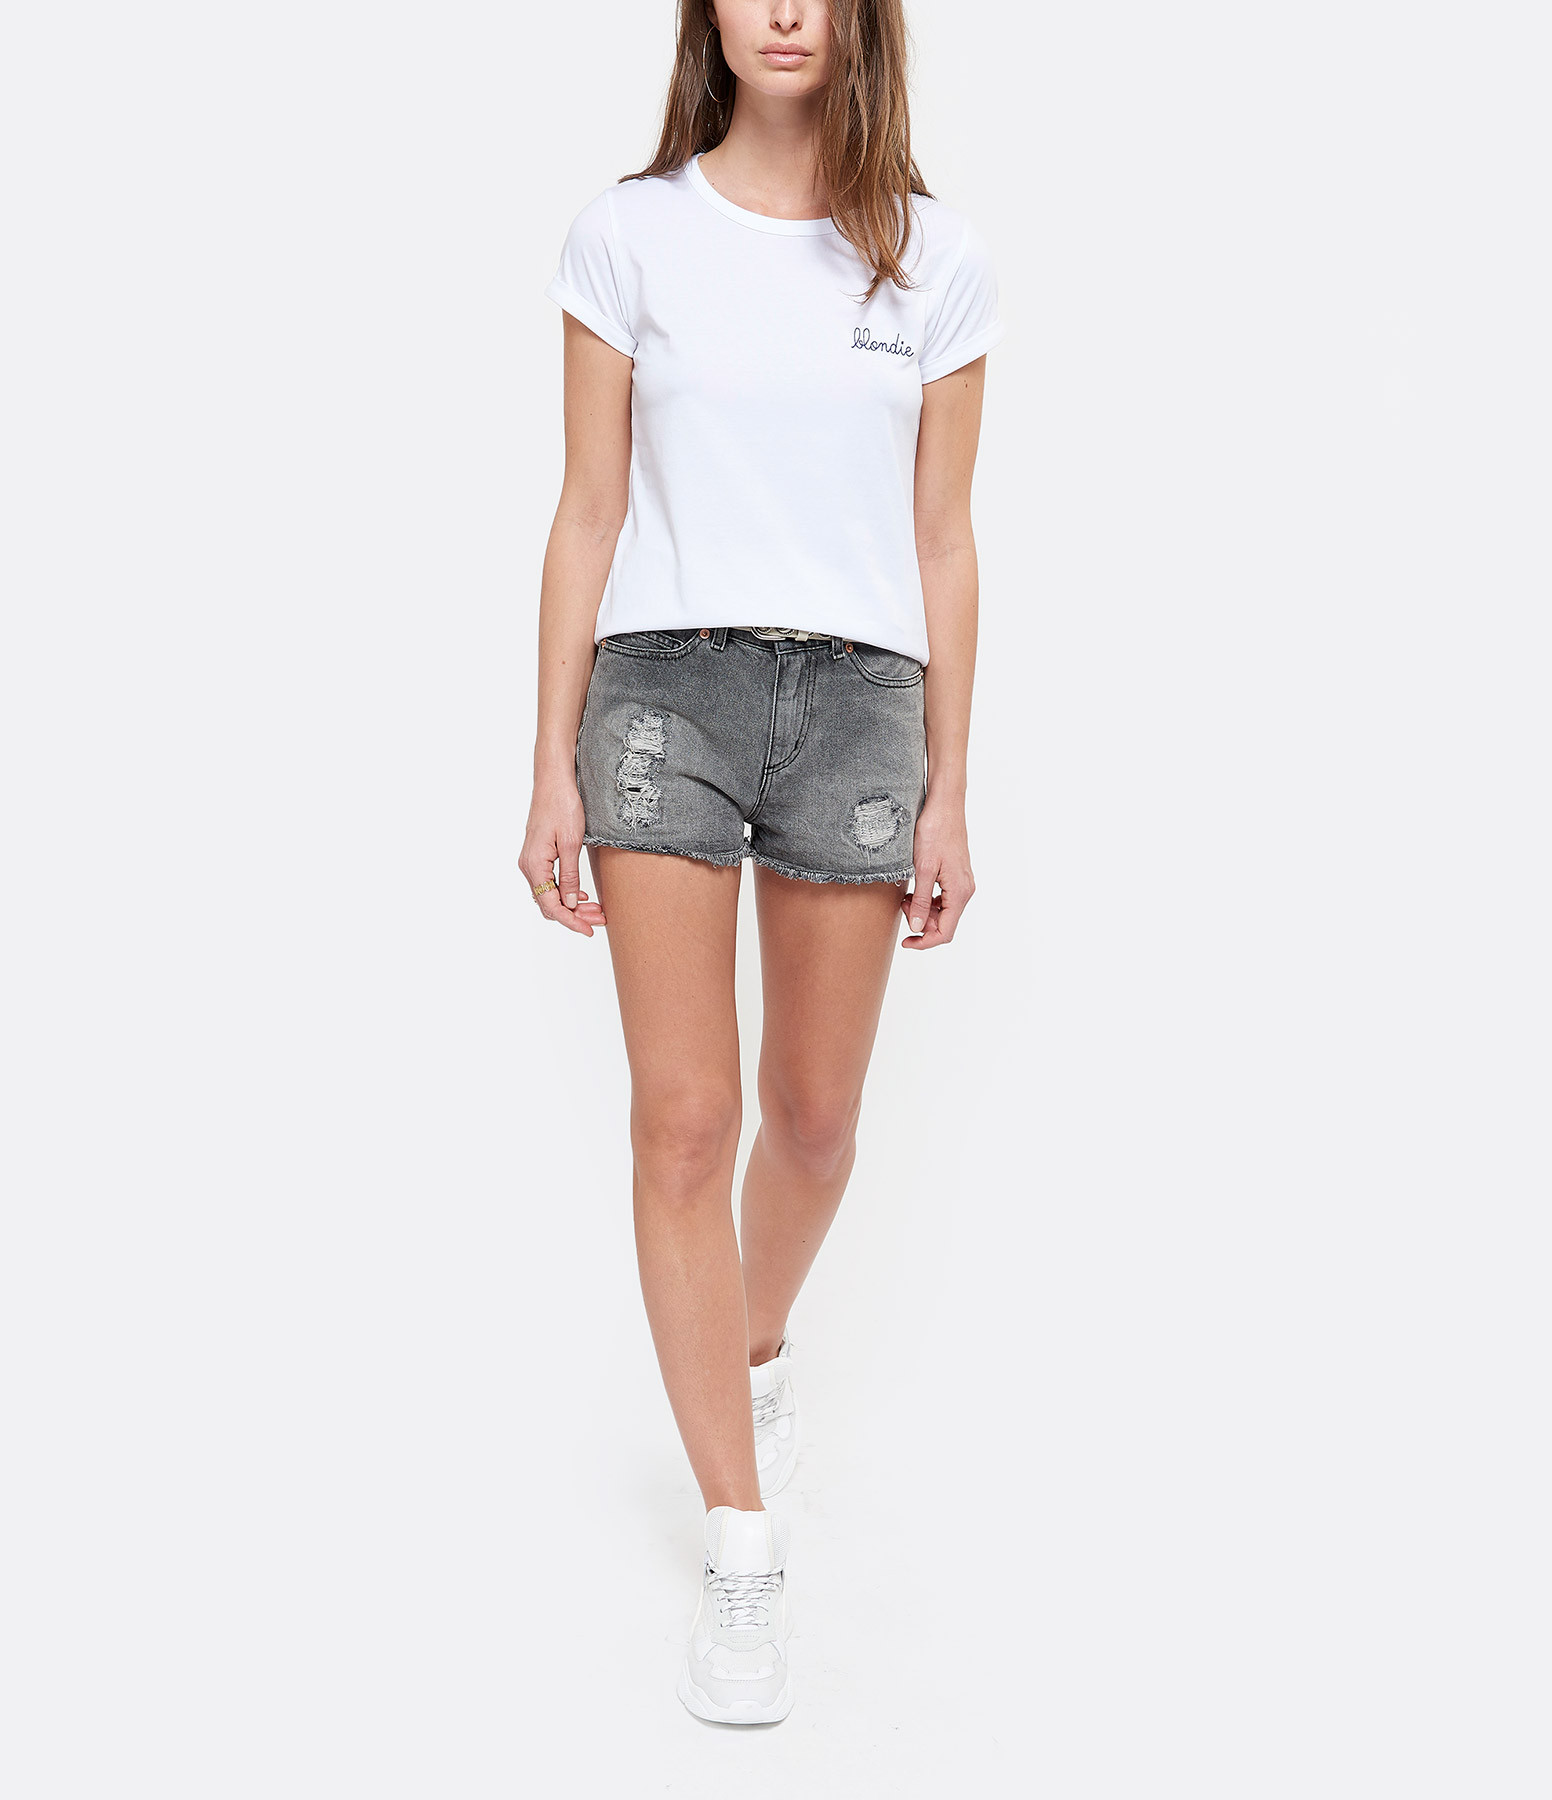 MAISON LABICHE - Tee-shirt Blondie Blanc Bleu